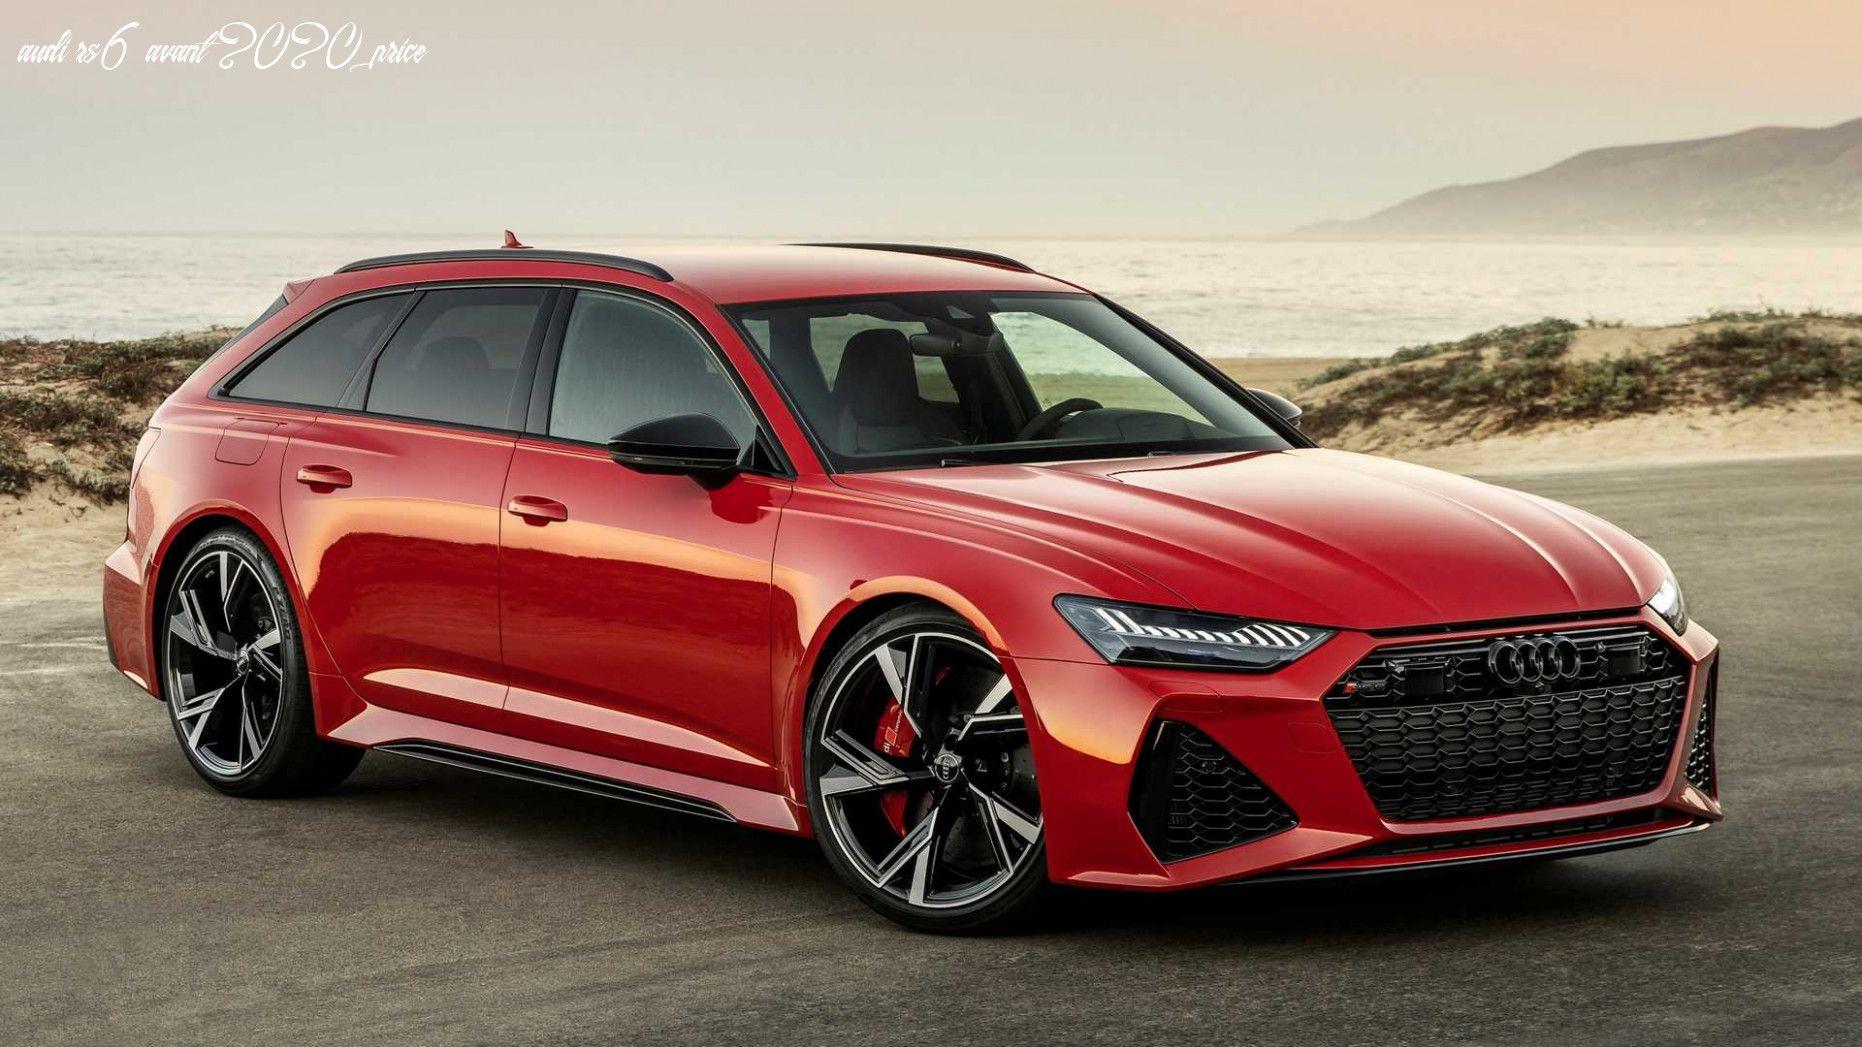 Audi Rs6 Avant 2020 Price In 2020 Audi Rs6 Audi Car